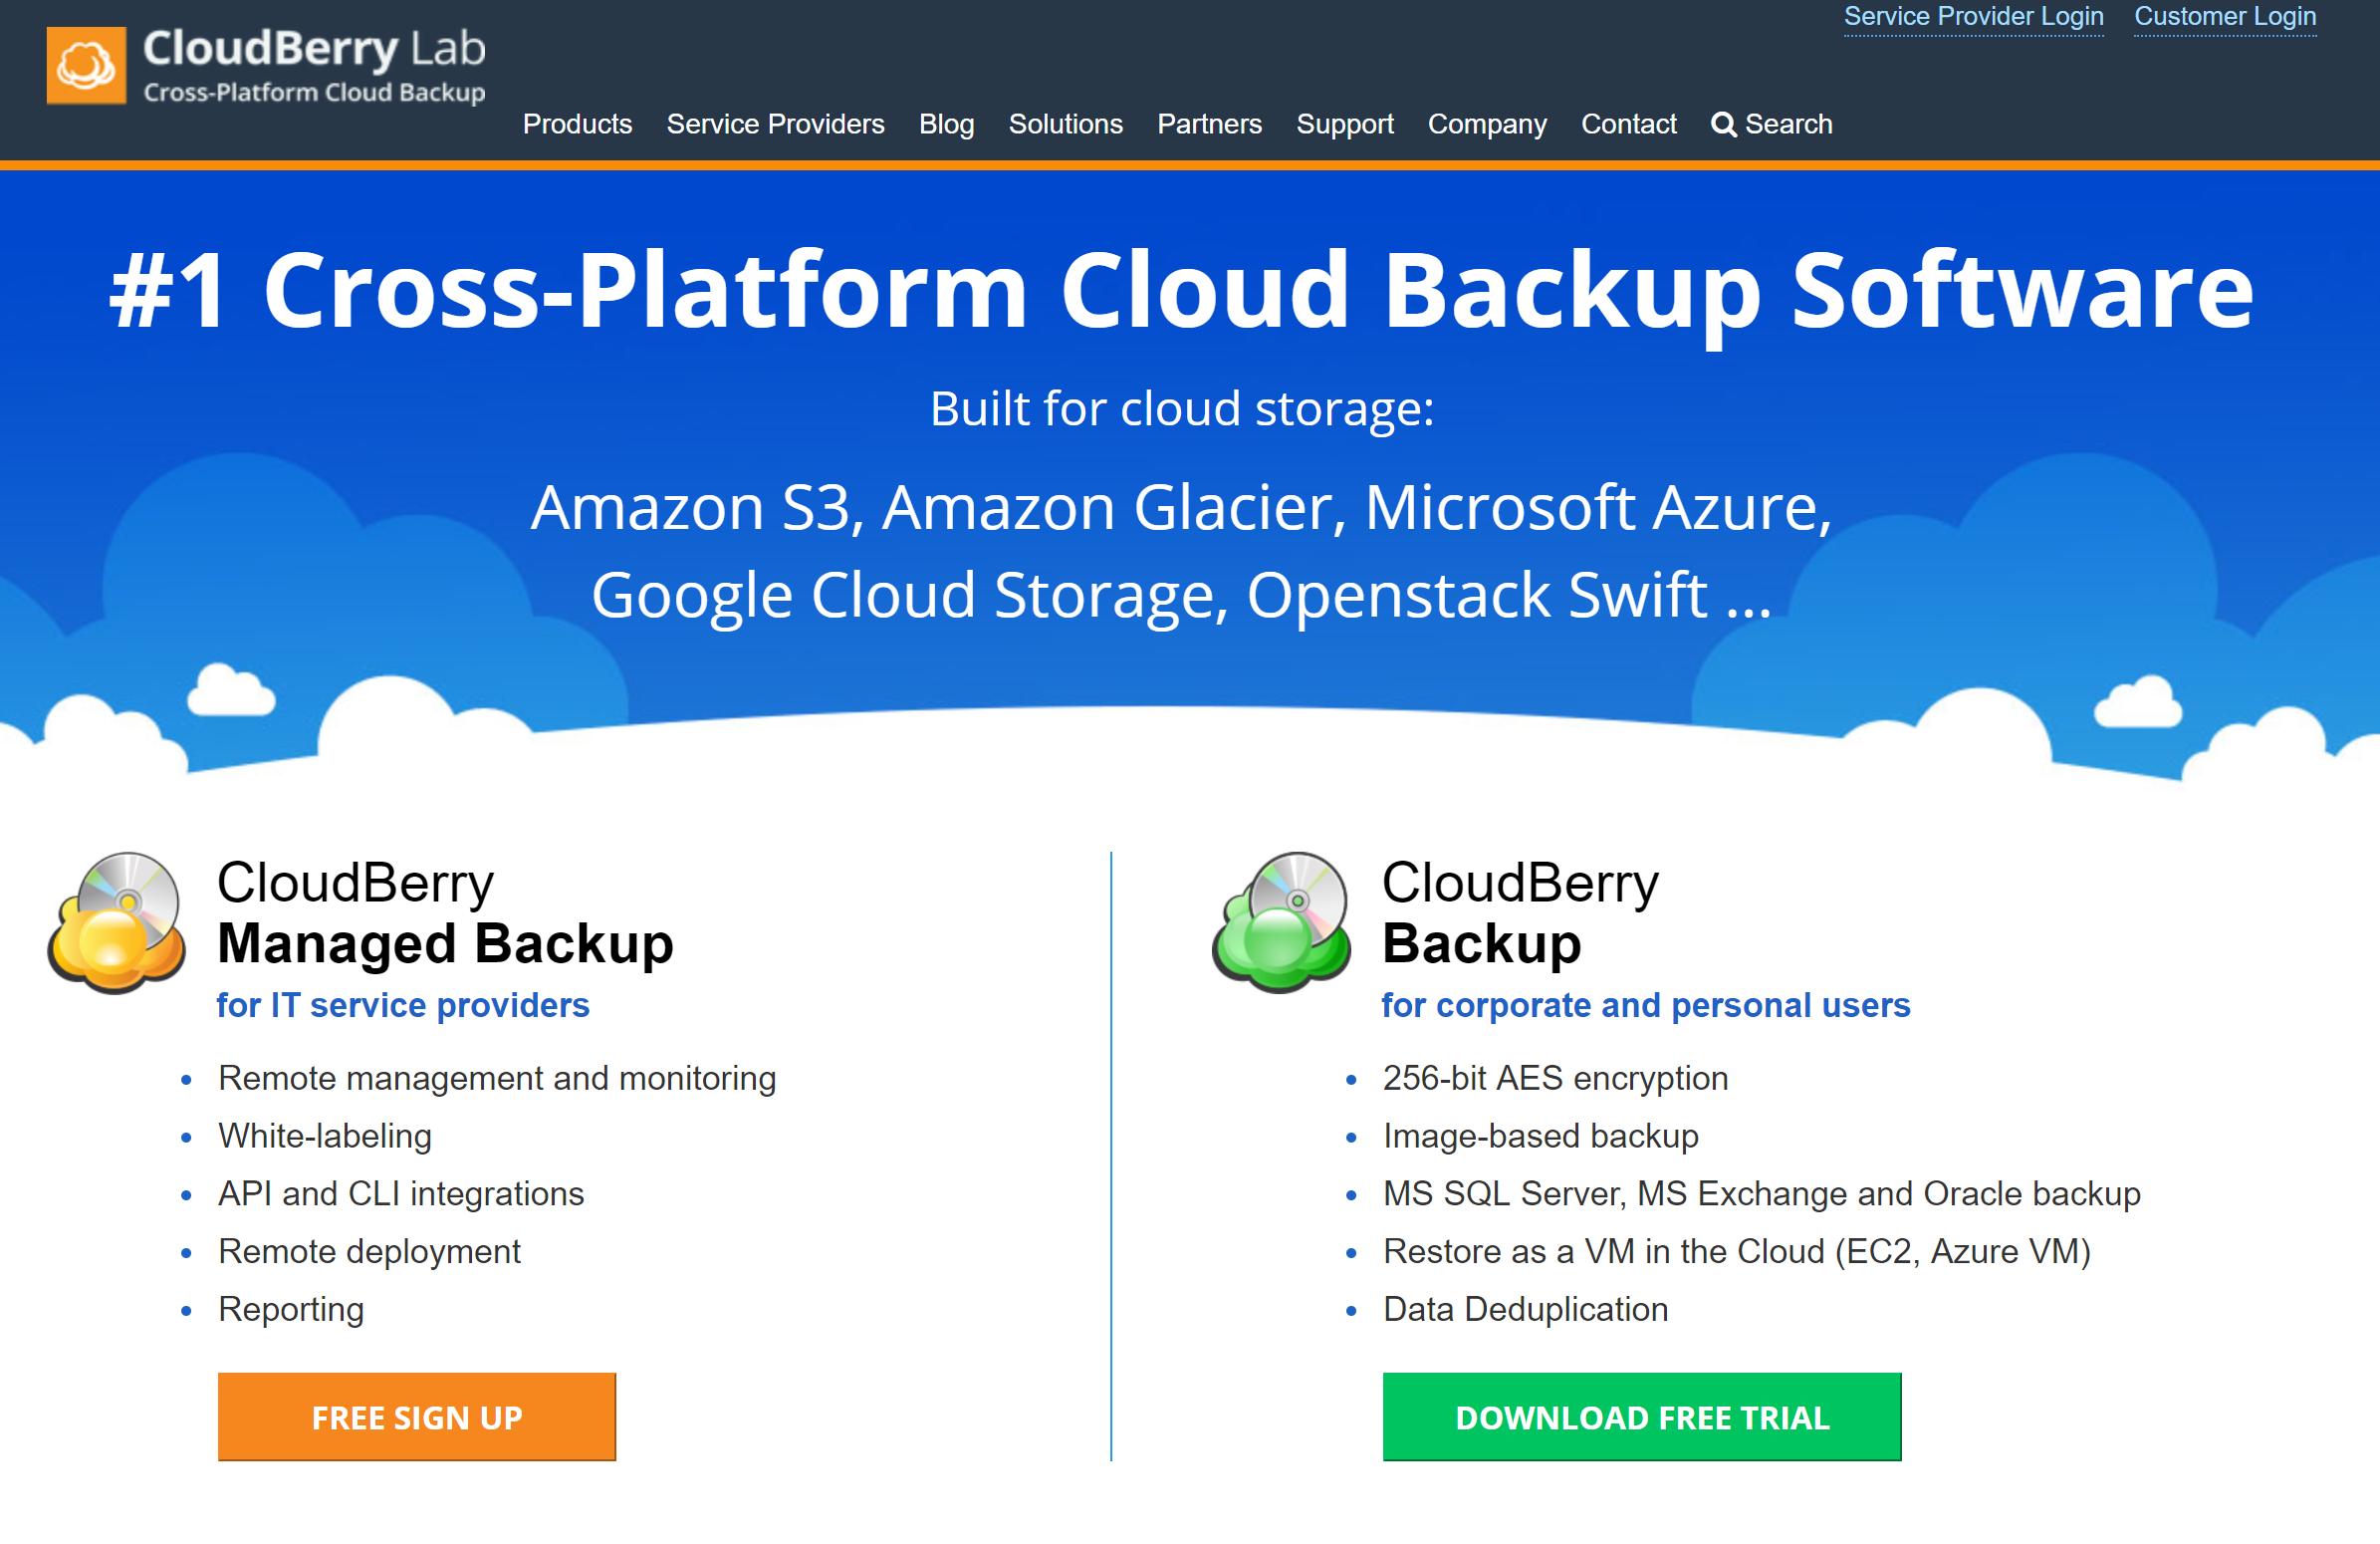 Cloudberry Cloud Backup Software